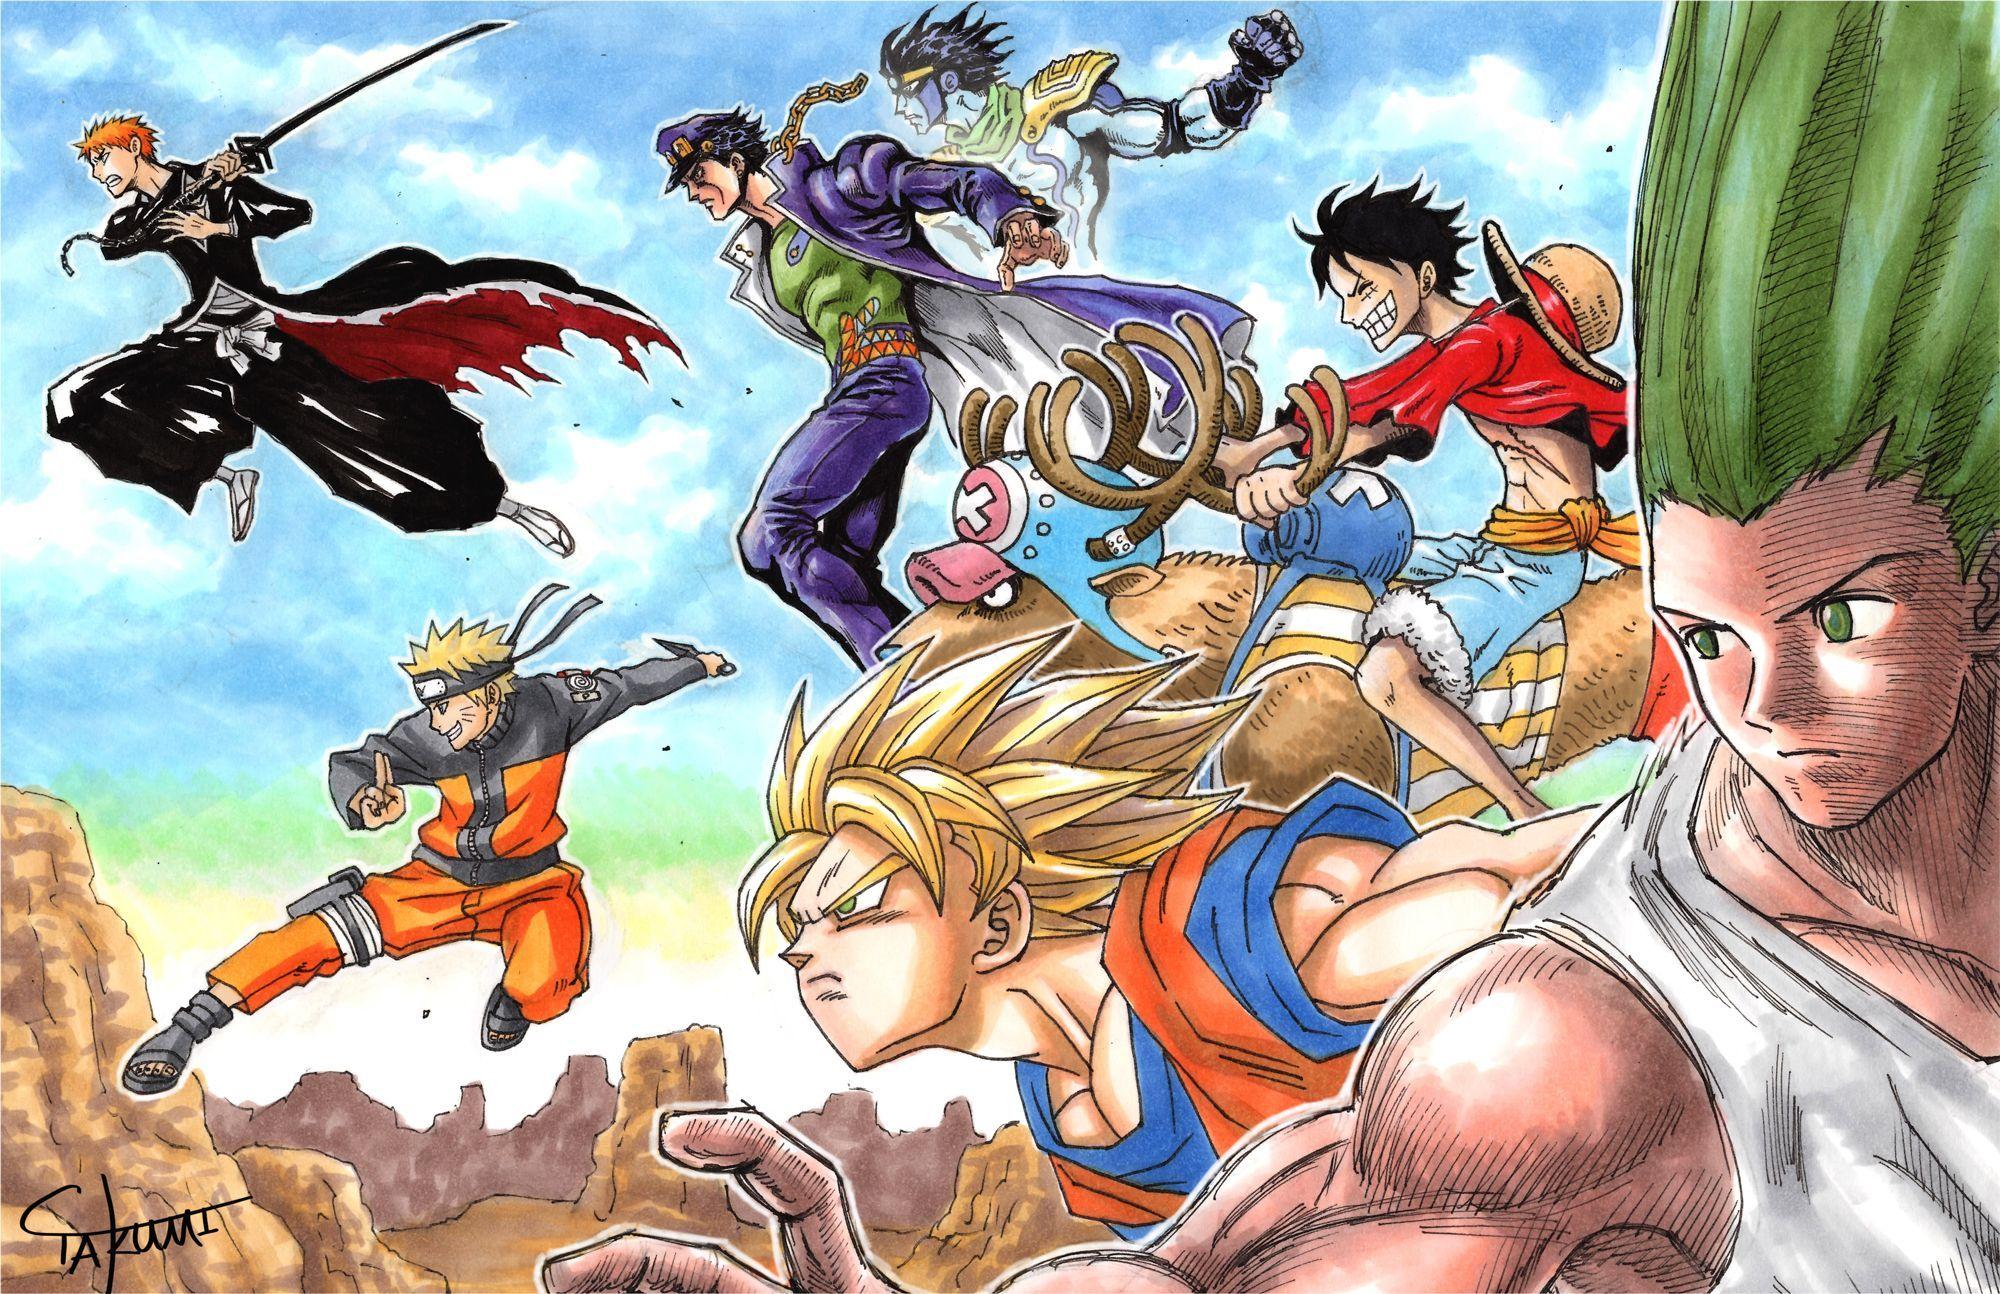 One Piece Dragon Ball Super Wallpaper Anime Crossover Hunter X Hunter Bleach Dragon Ball Z One Download Wallpapers Veg Anime Crossover Anime Naruto Wallpaper Anime crossover wallpaper 4k